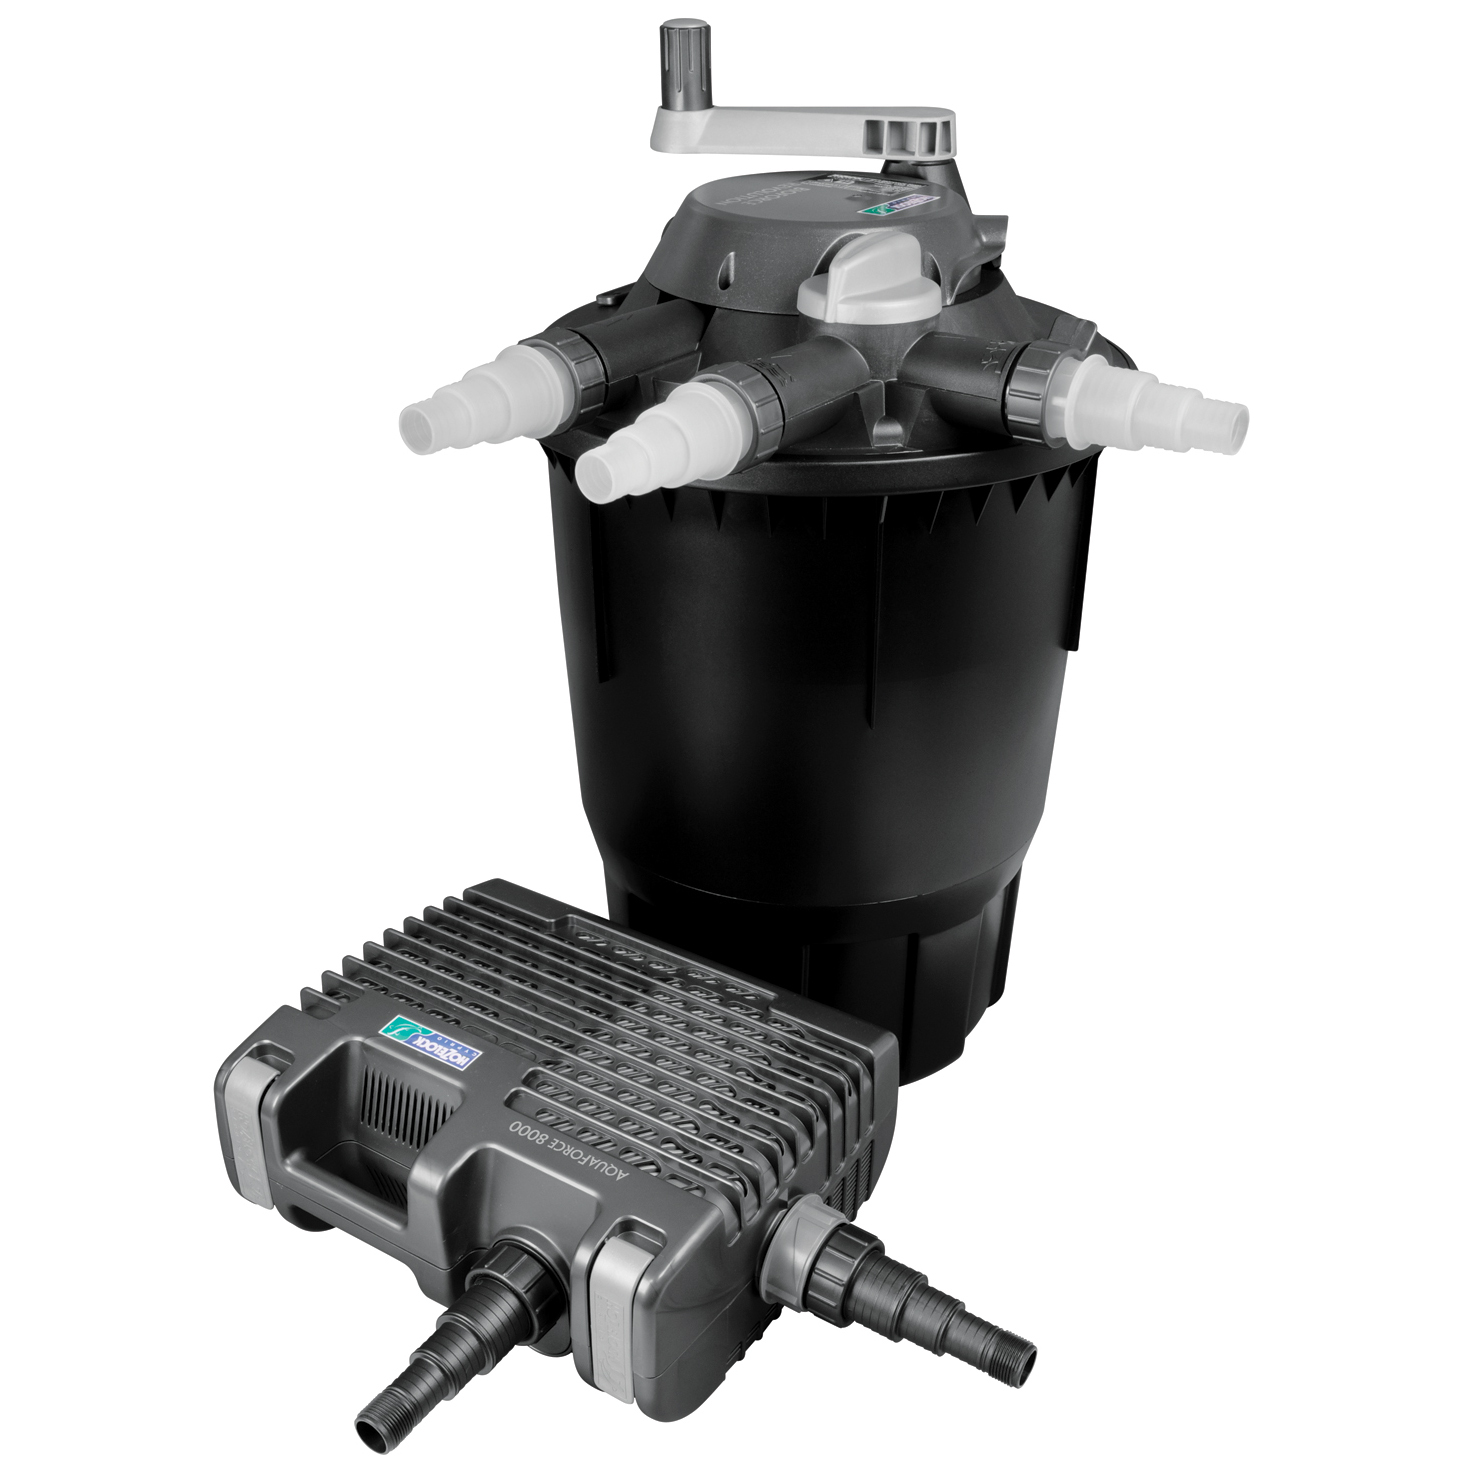 New hozelock bioforce revolution 14000 uvc filtration for Pond filter